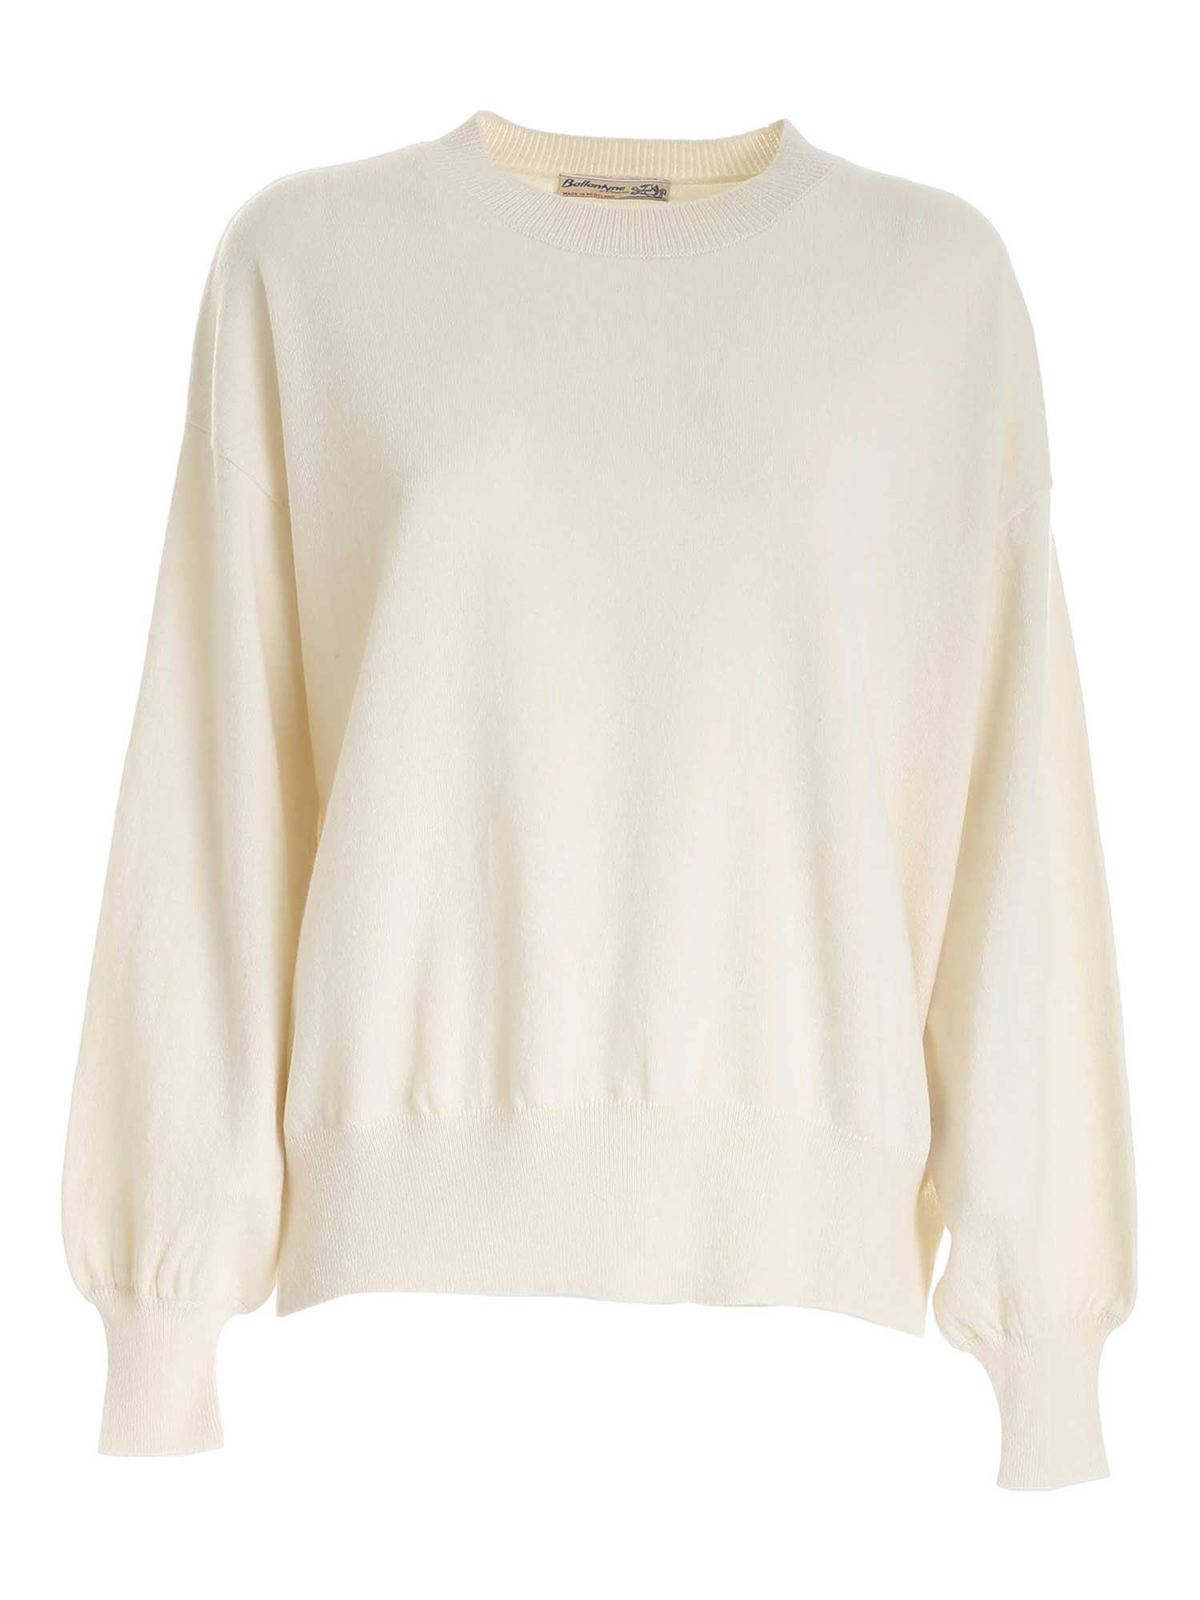 Ballantyne Crewneck Sweater In White